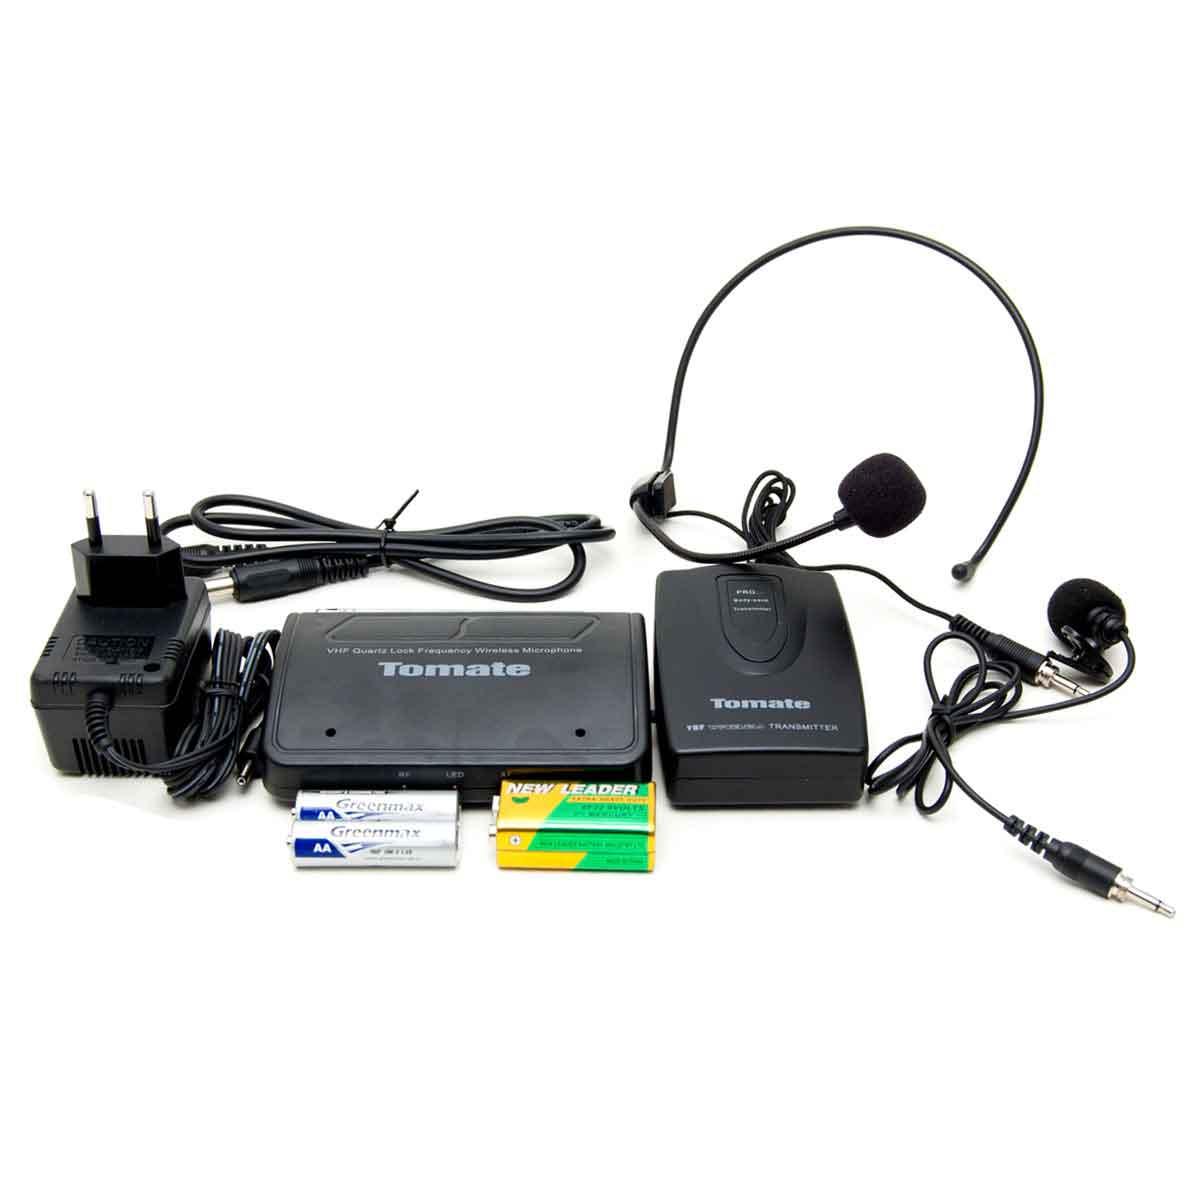 Microfone Lapela Sem Fio Profissional Wireless 50 mt Headset